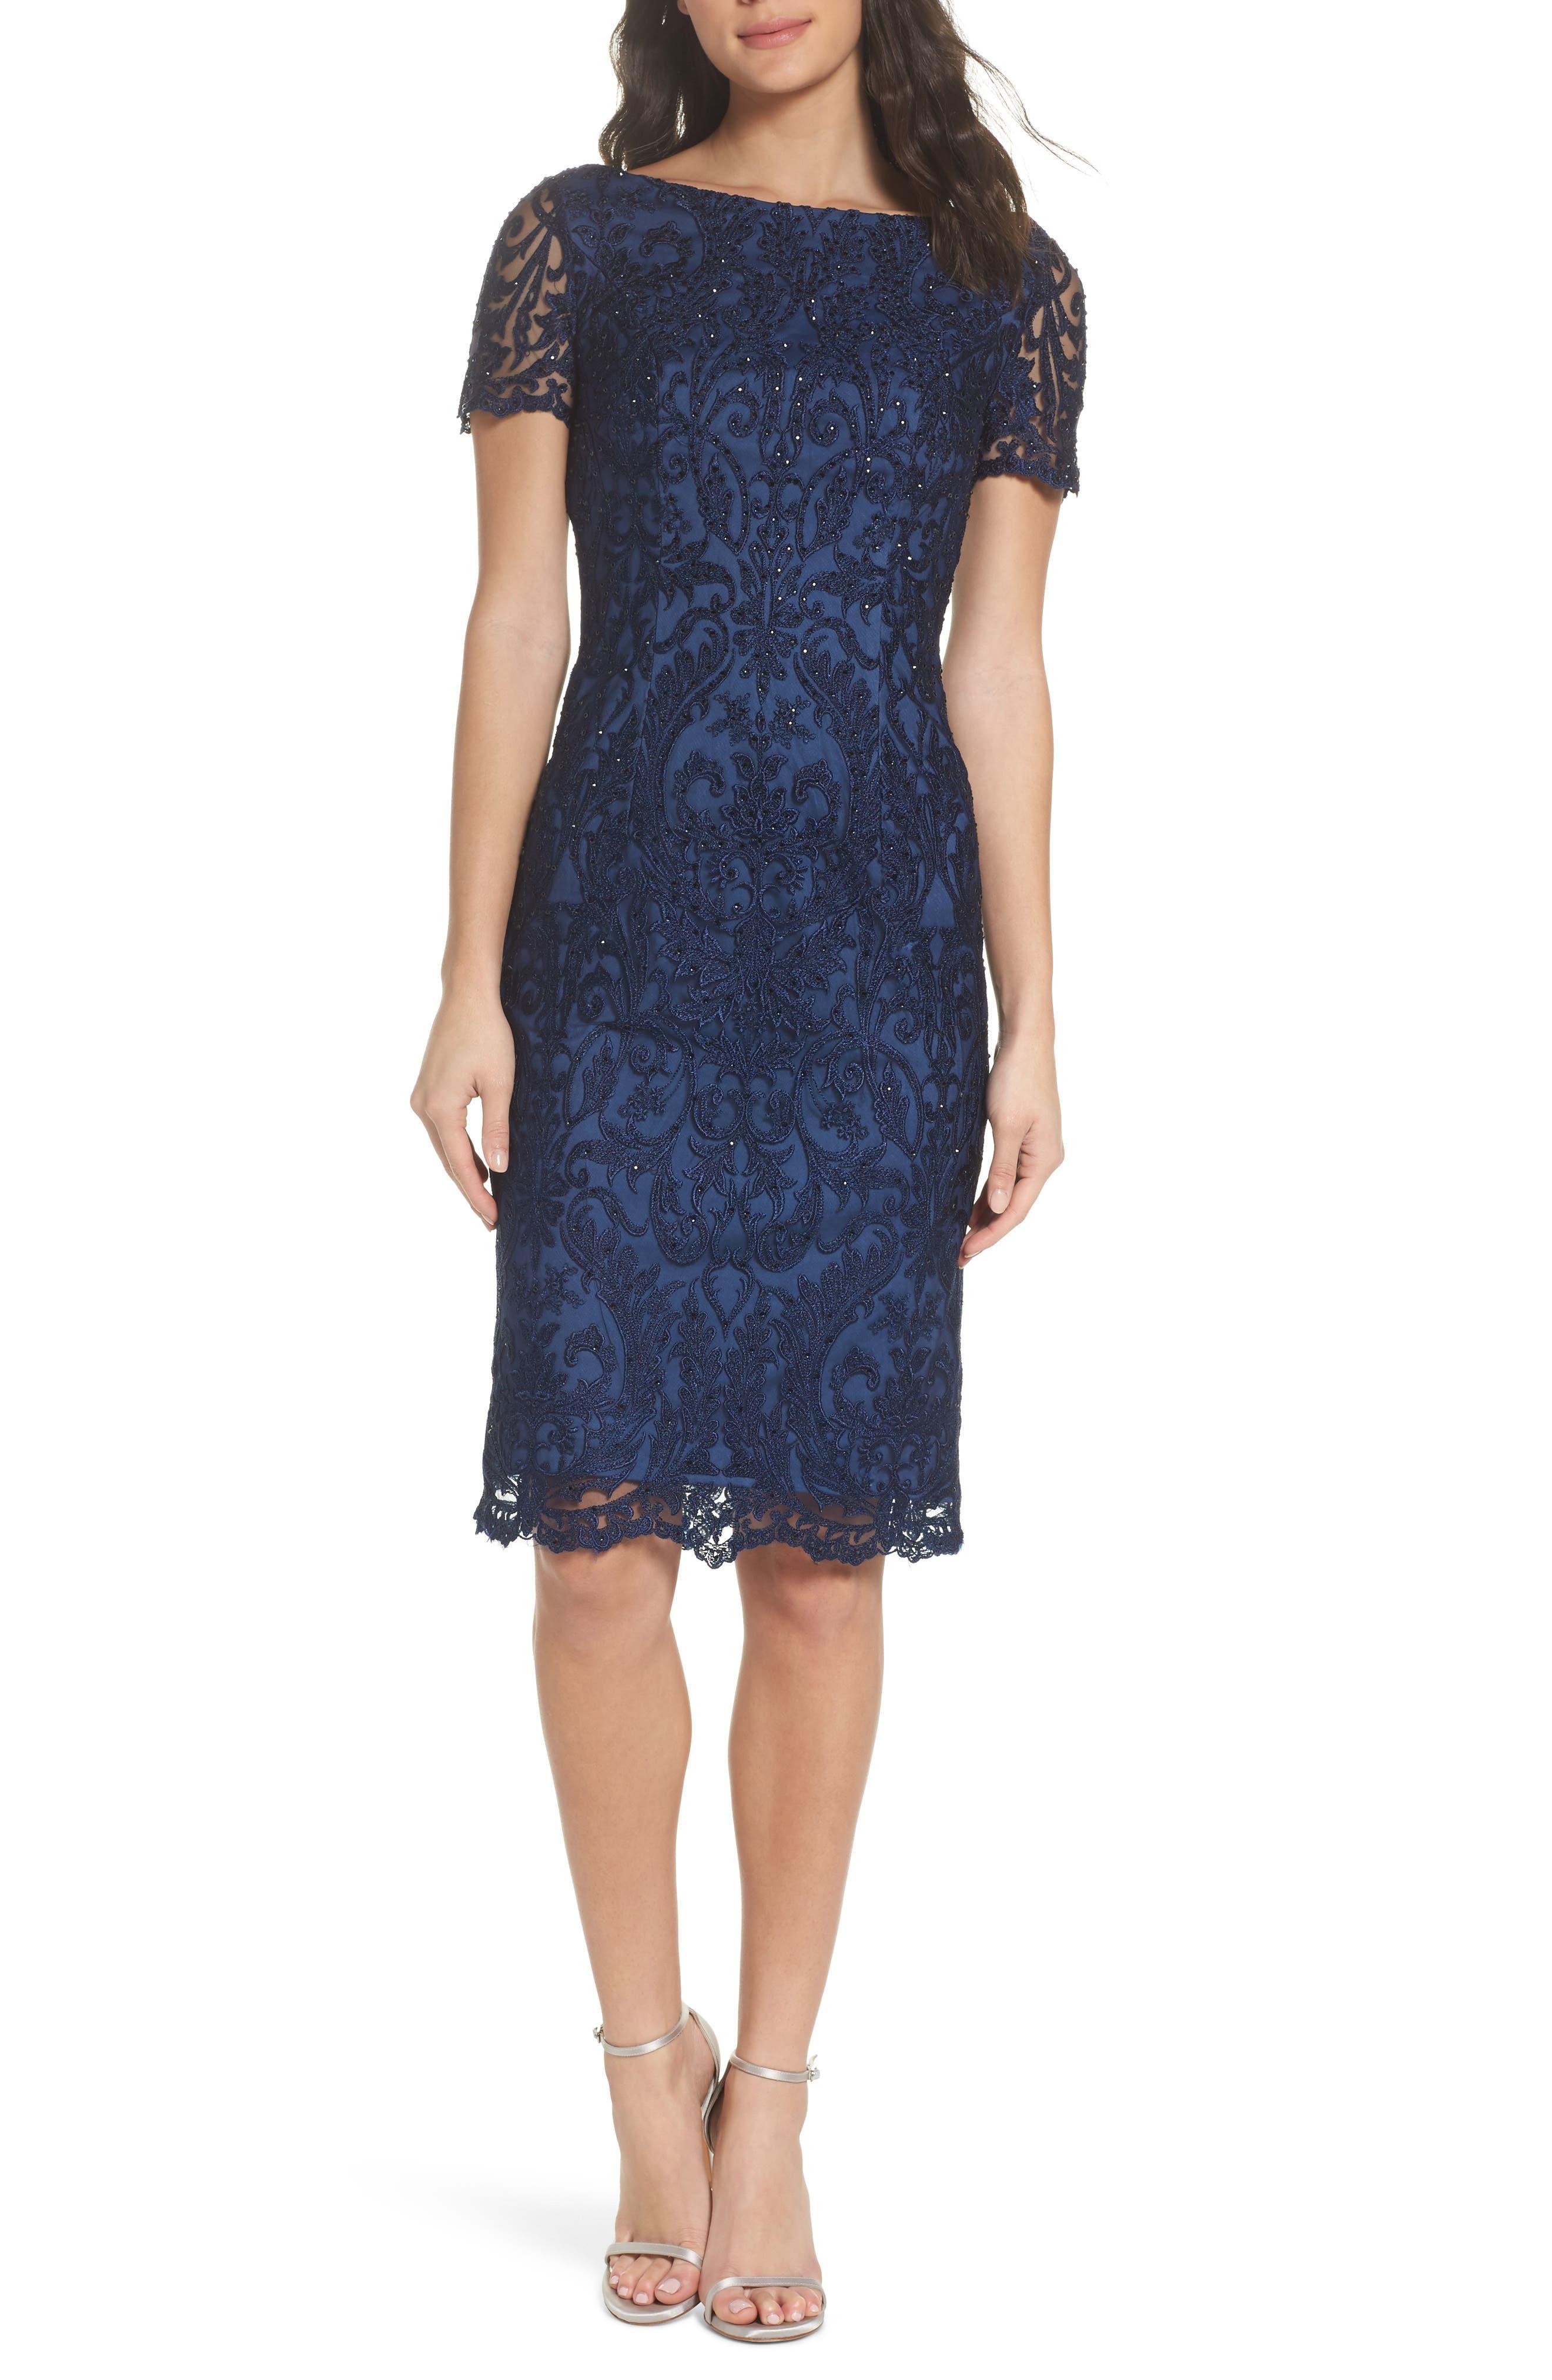 Alternate Image 1 Selected - La Femme Beaded Lace Sheath Dress